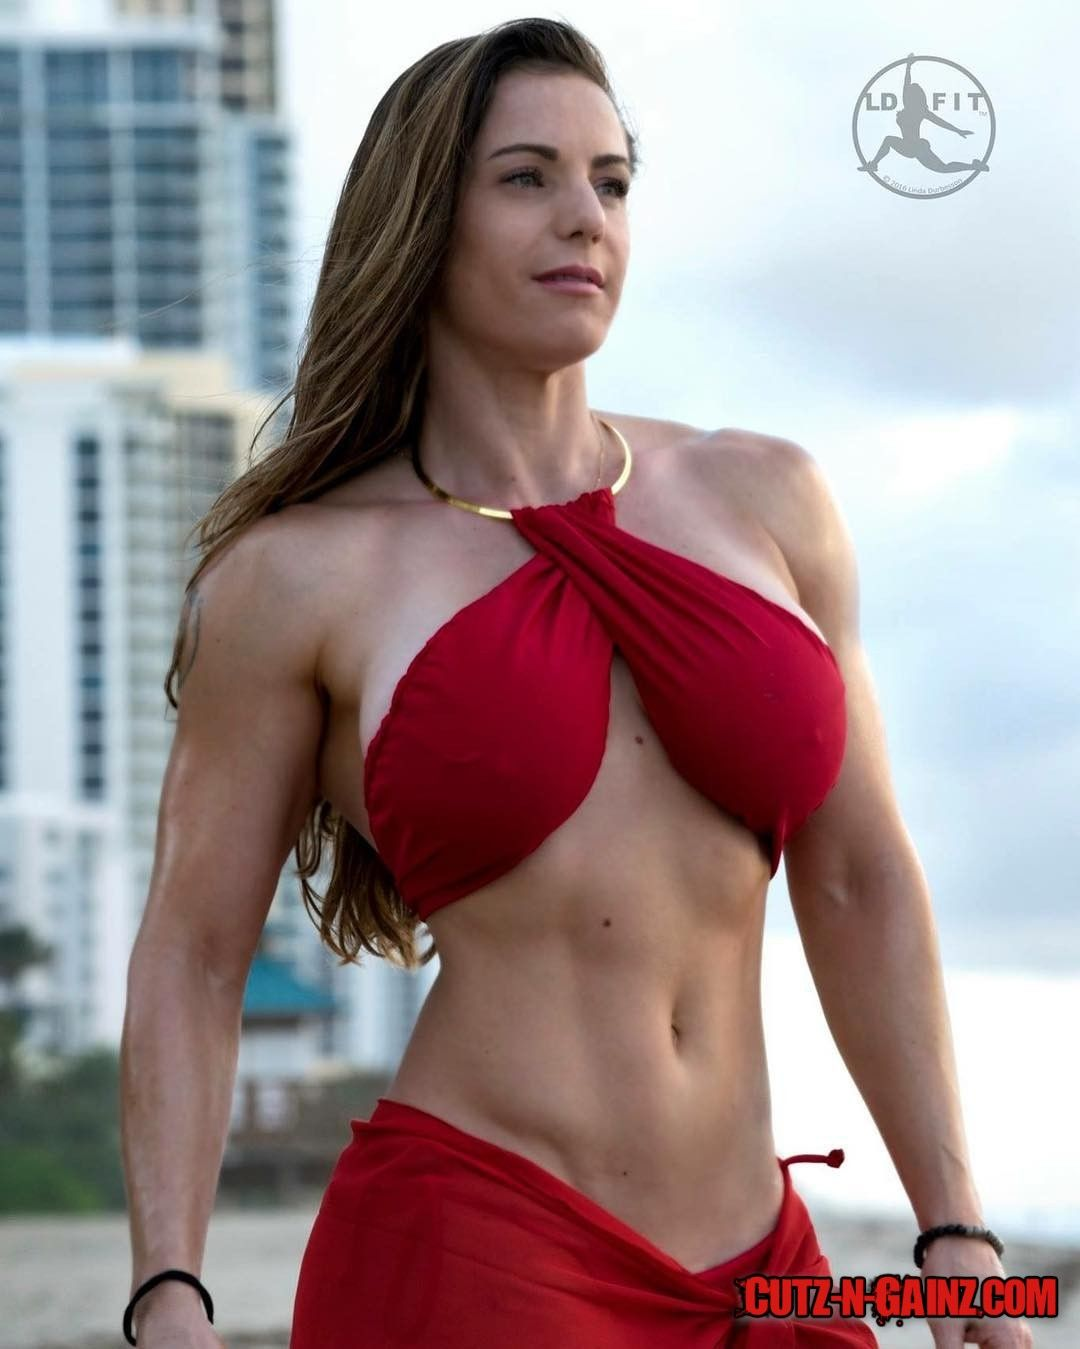 Hot Linda Durbesson nudes (14 photos), Sexy, Bikini, Boobs, underwear 2015